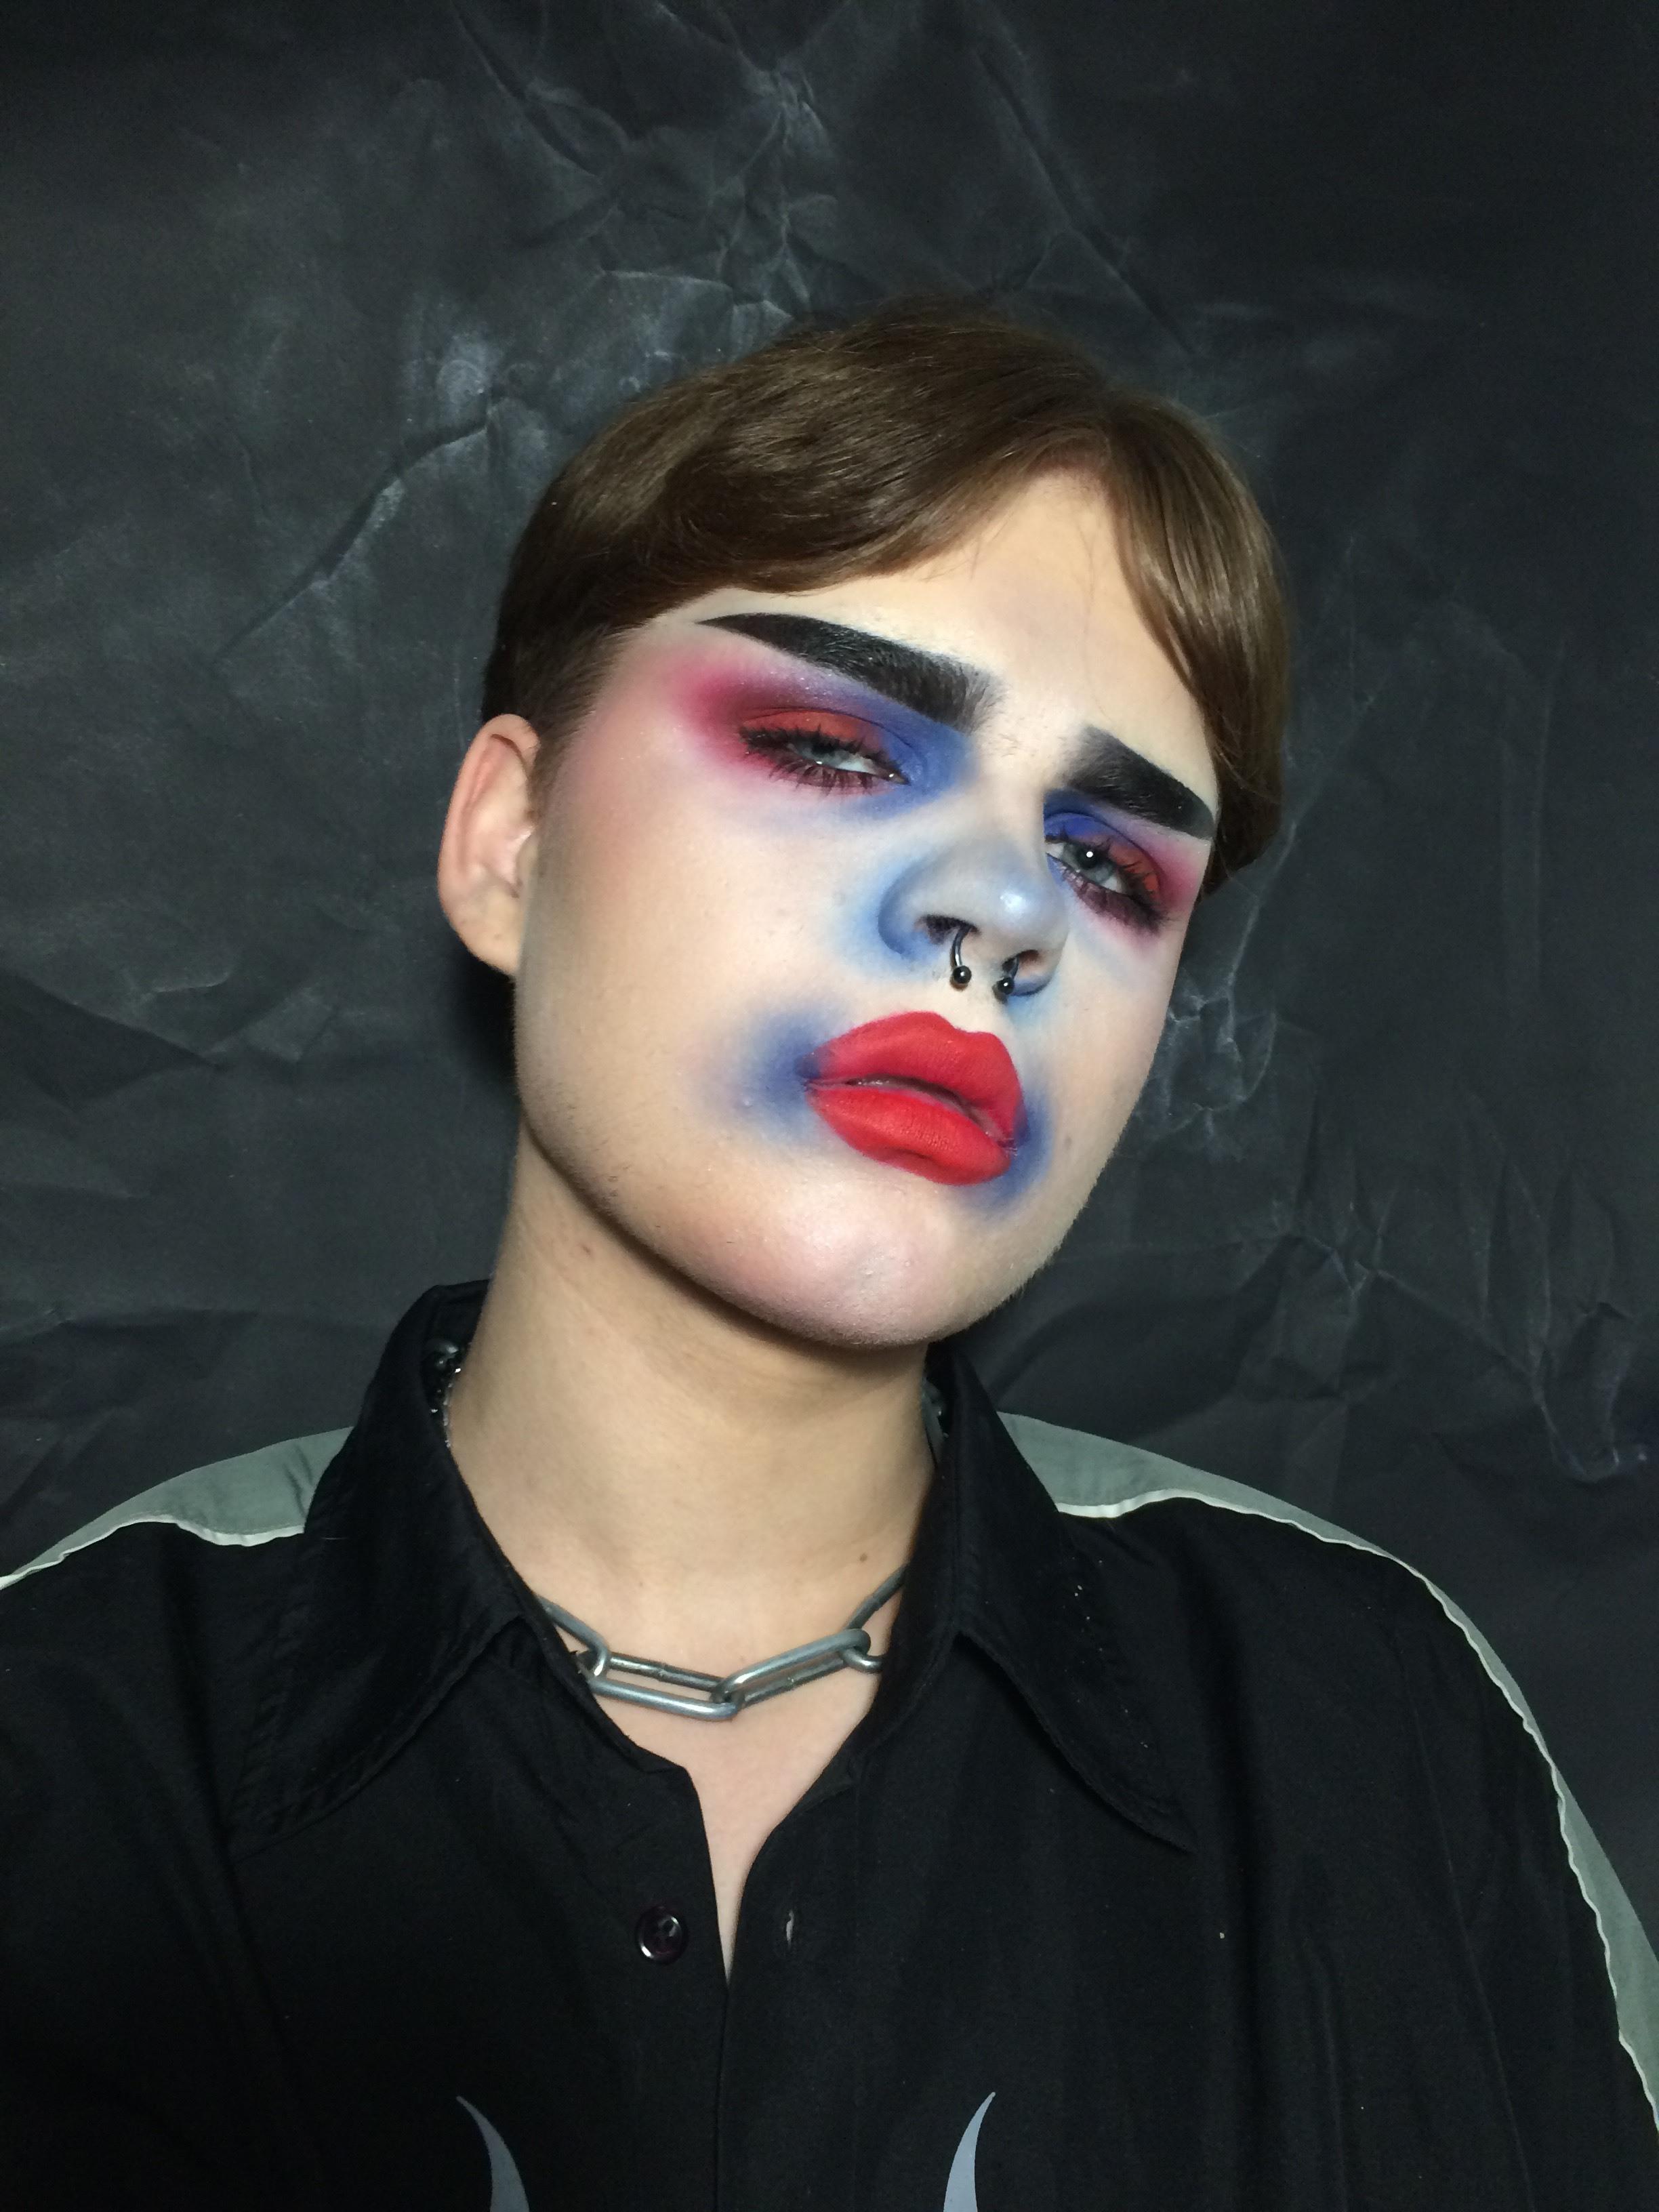 makeup experiments | prettyugly.eu